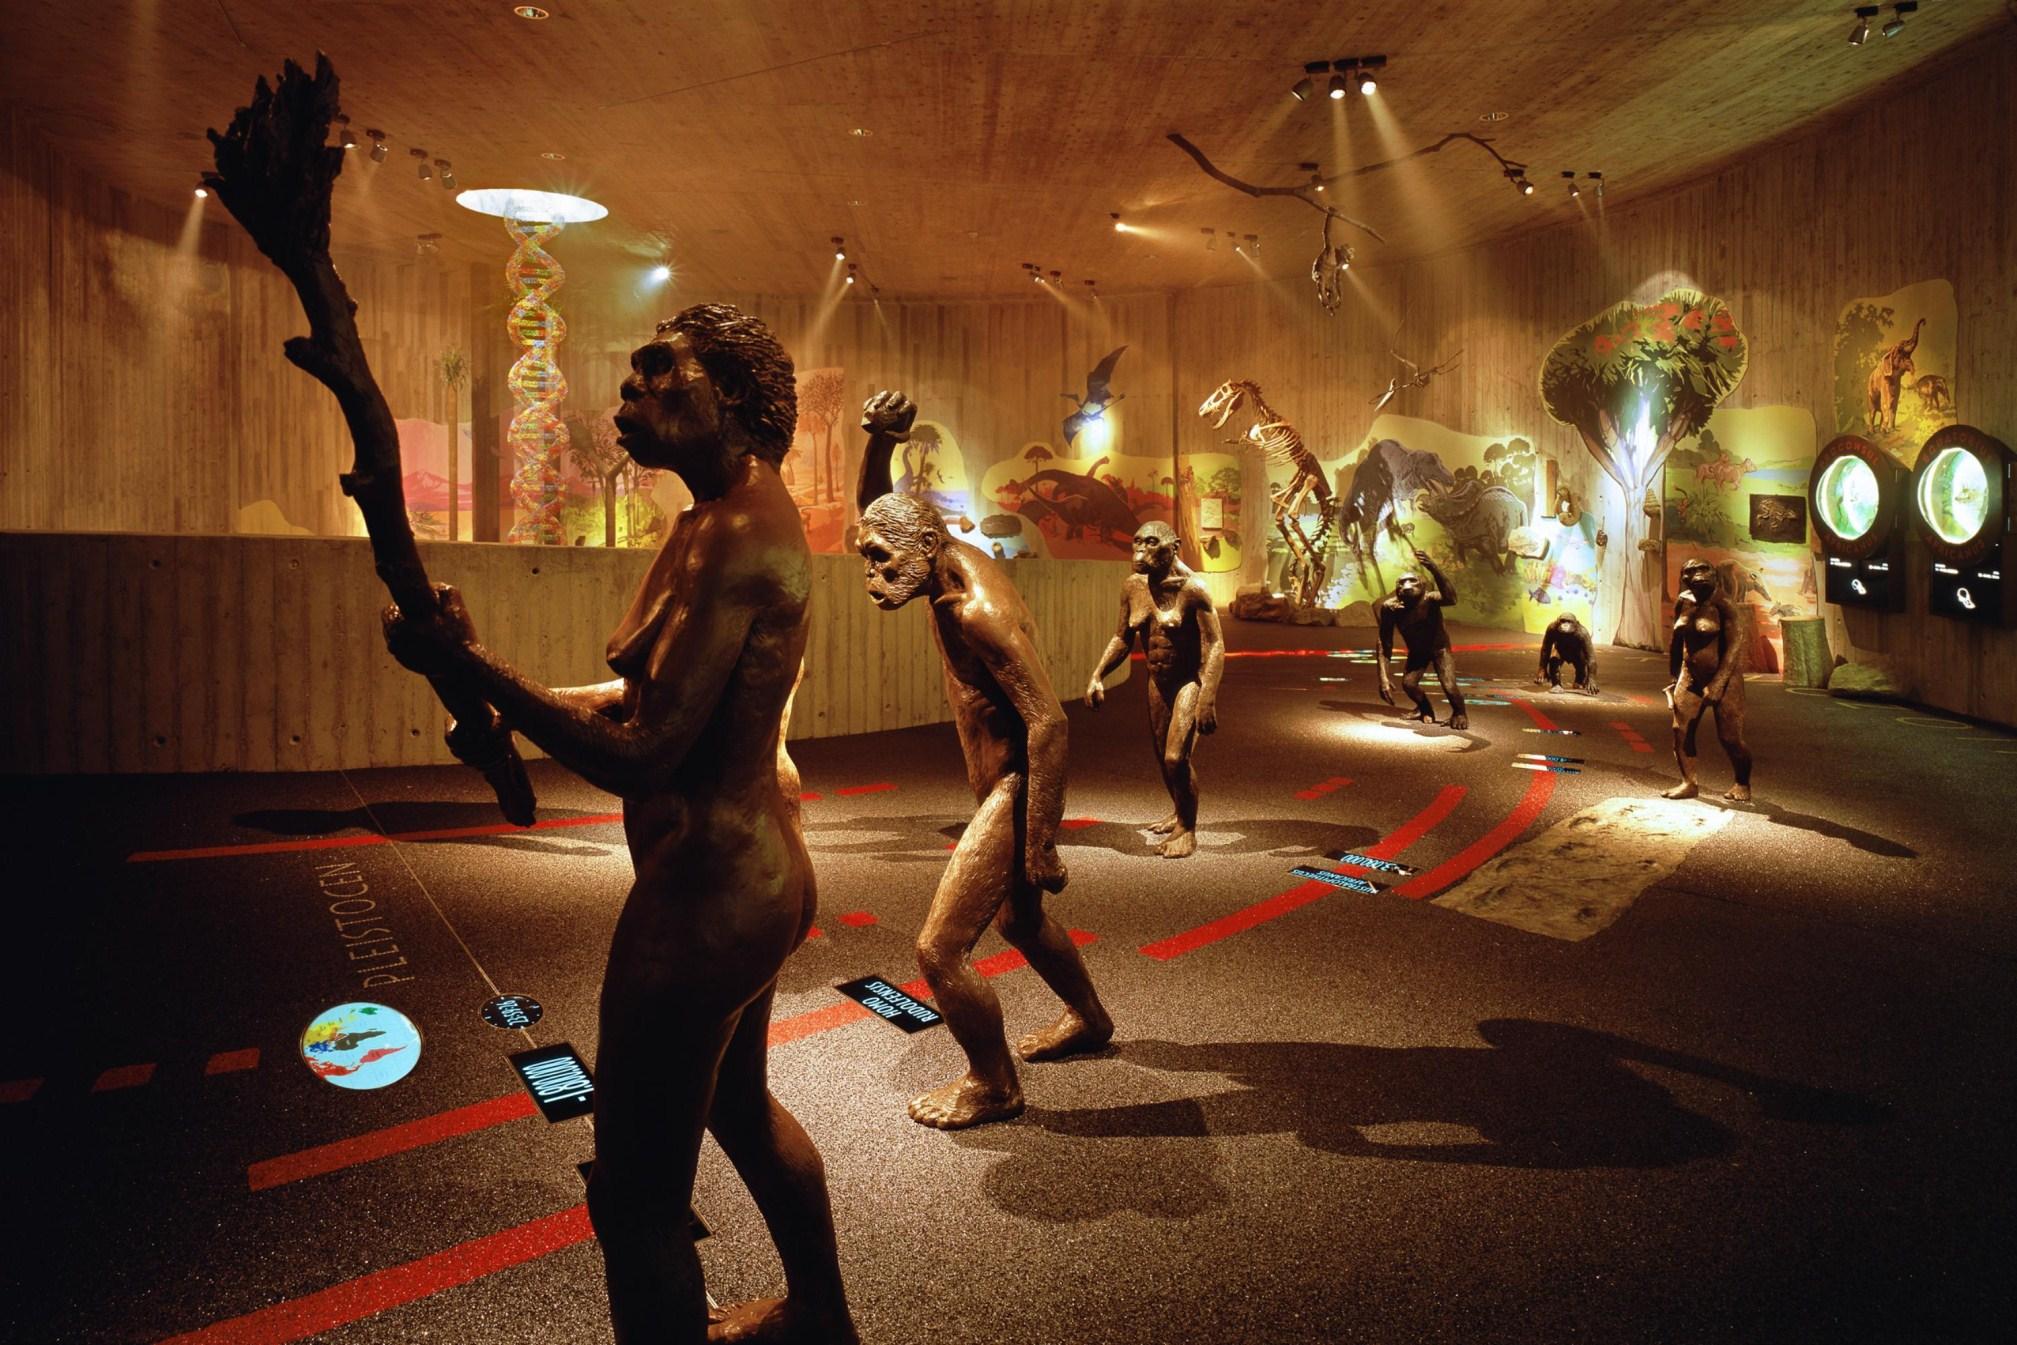 Pračovjek na korak od baroka: Muzej krapinskog neandertalca